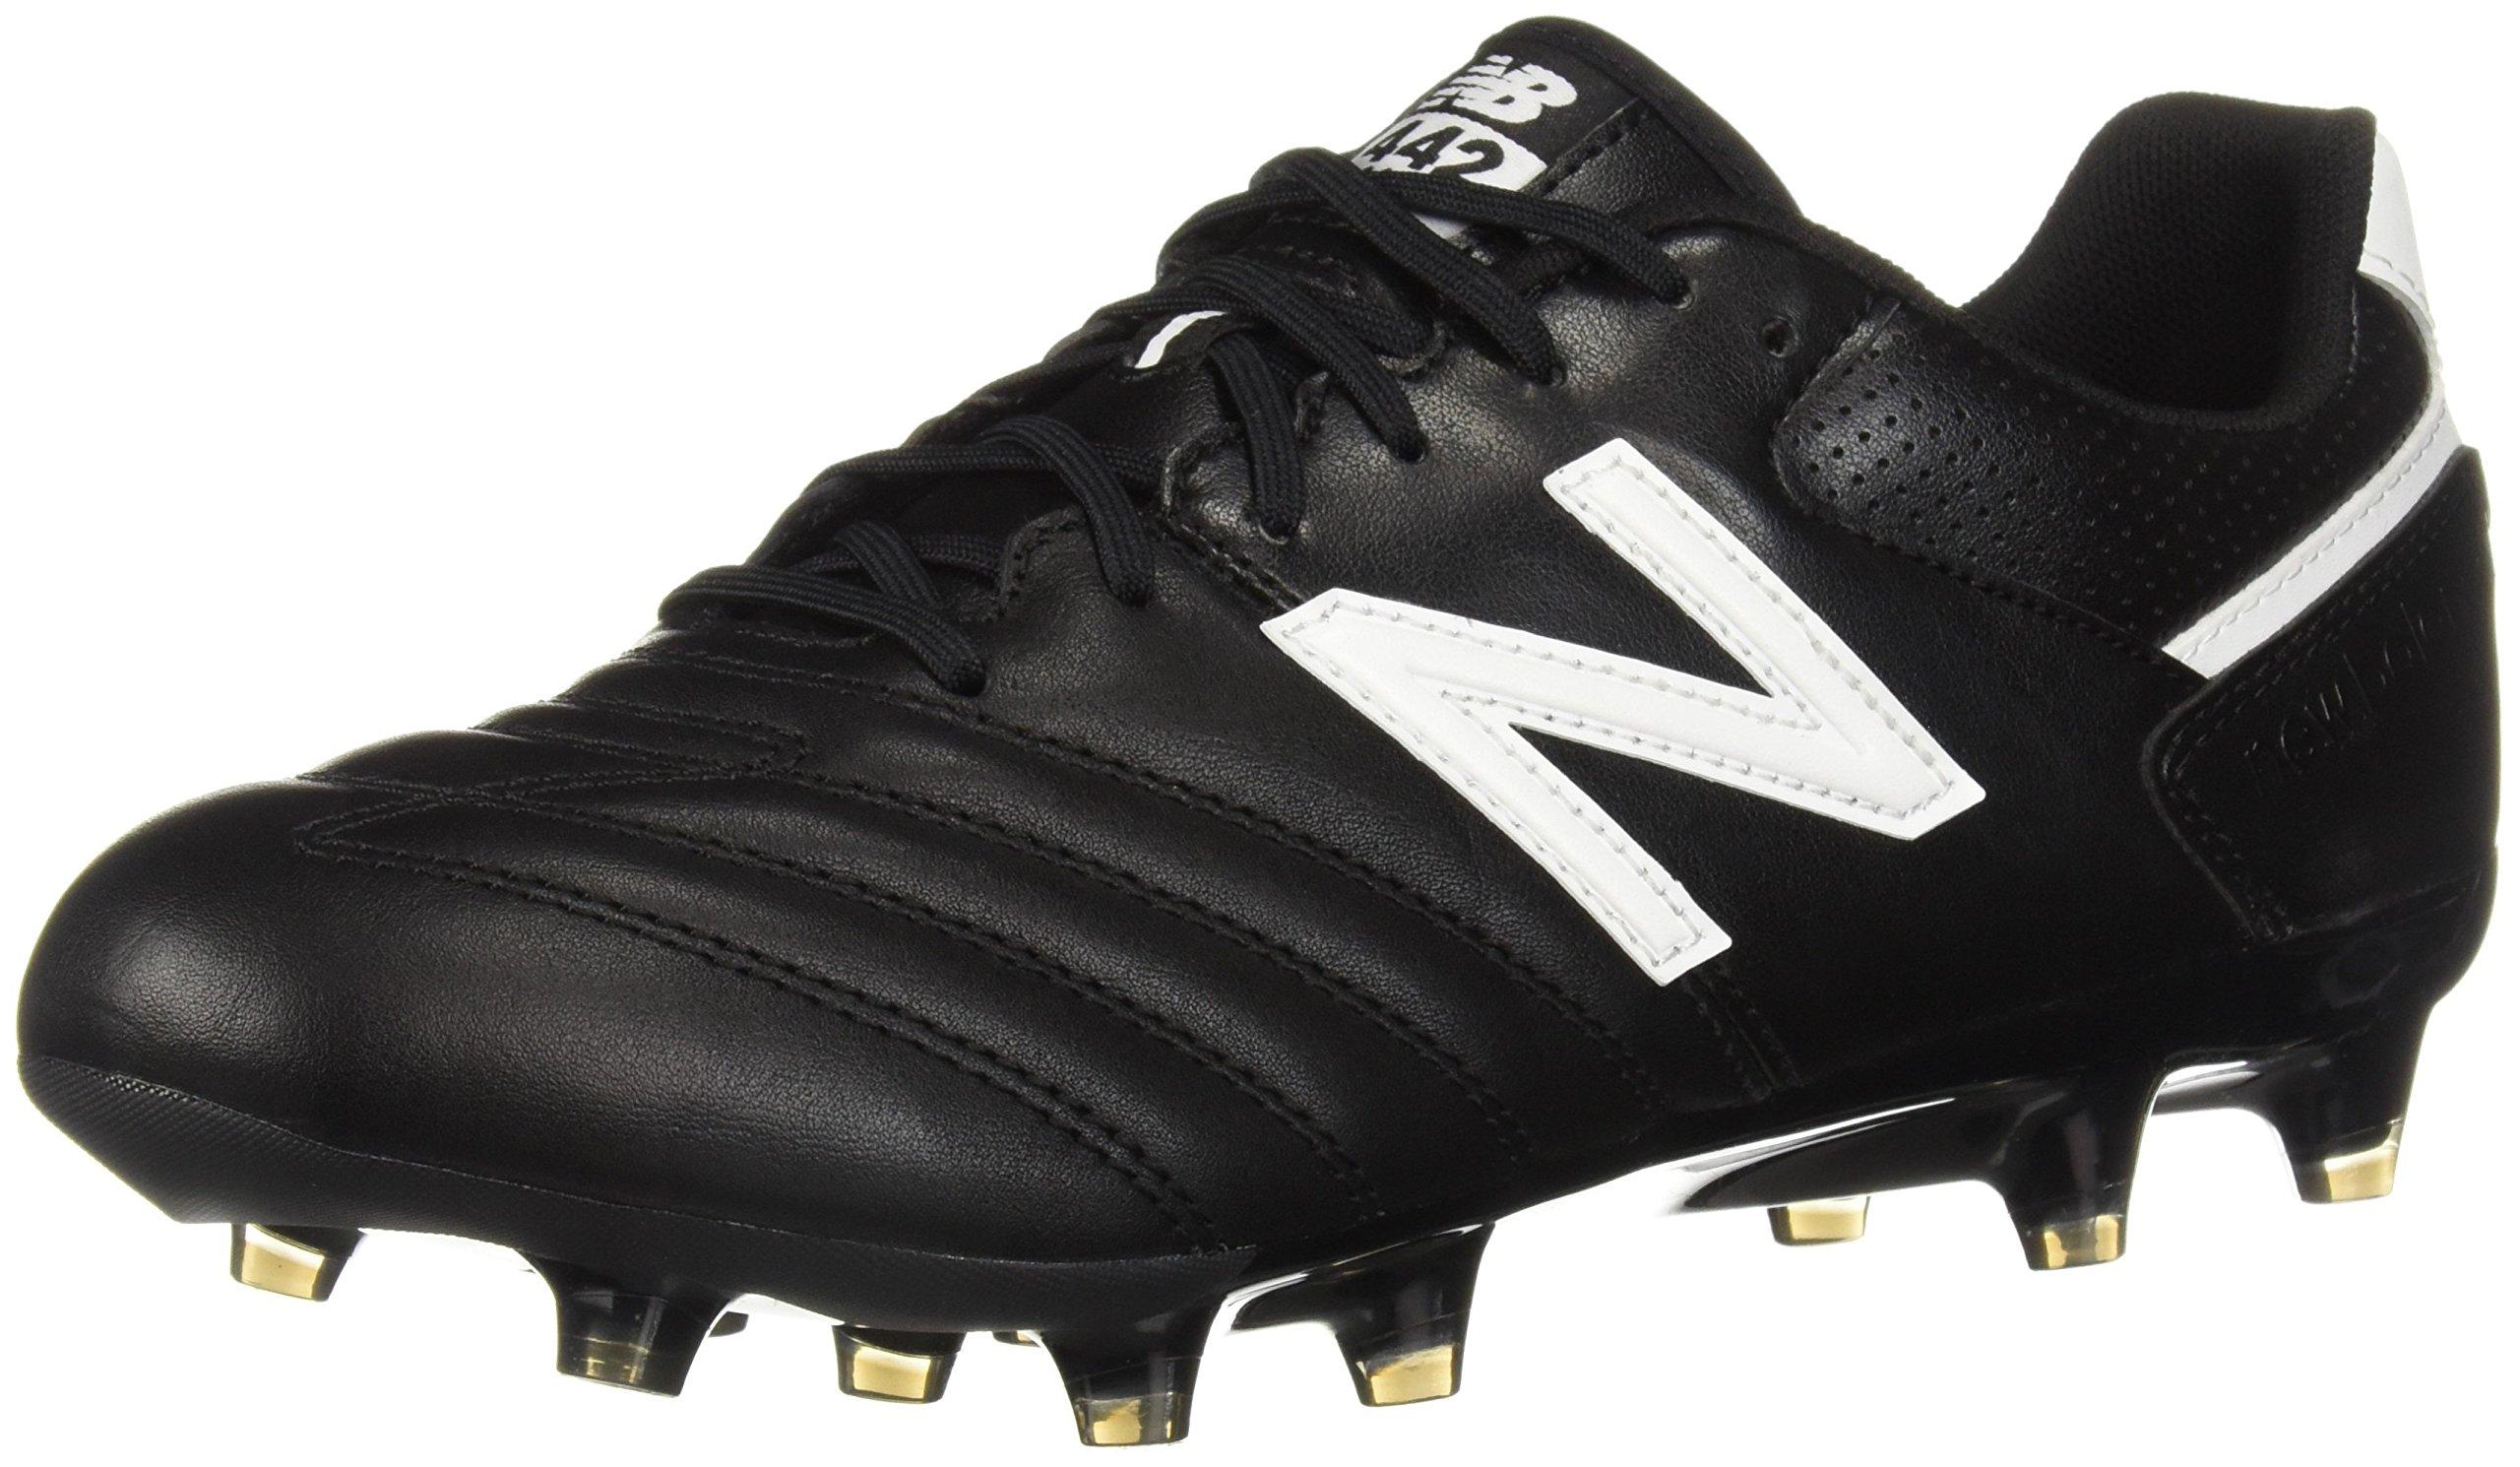 New Balance Men's 442 Team FG V1 Classic Soccer Shoe, Black/White, 10.5 2E US